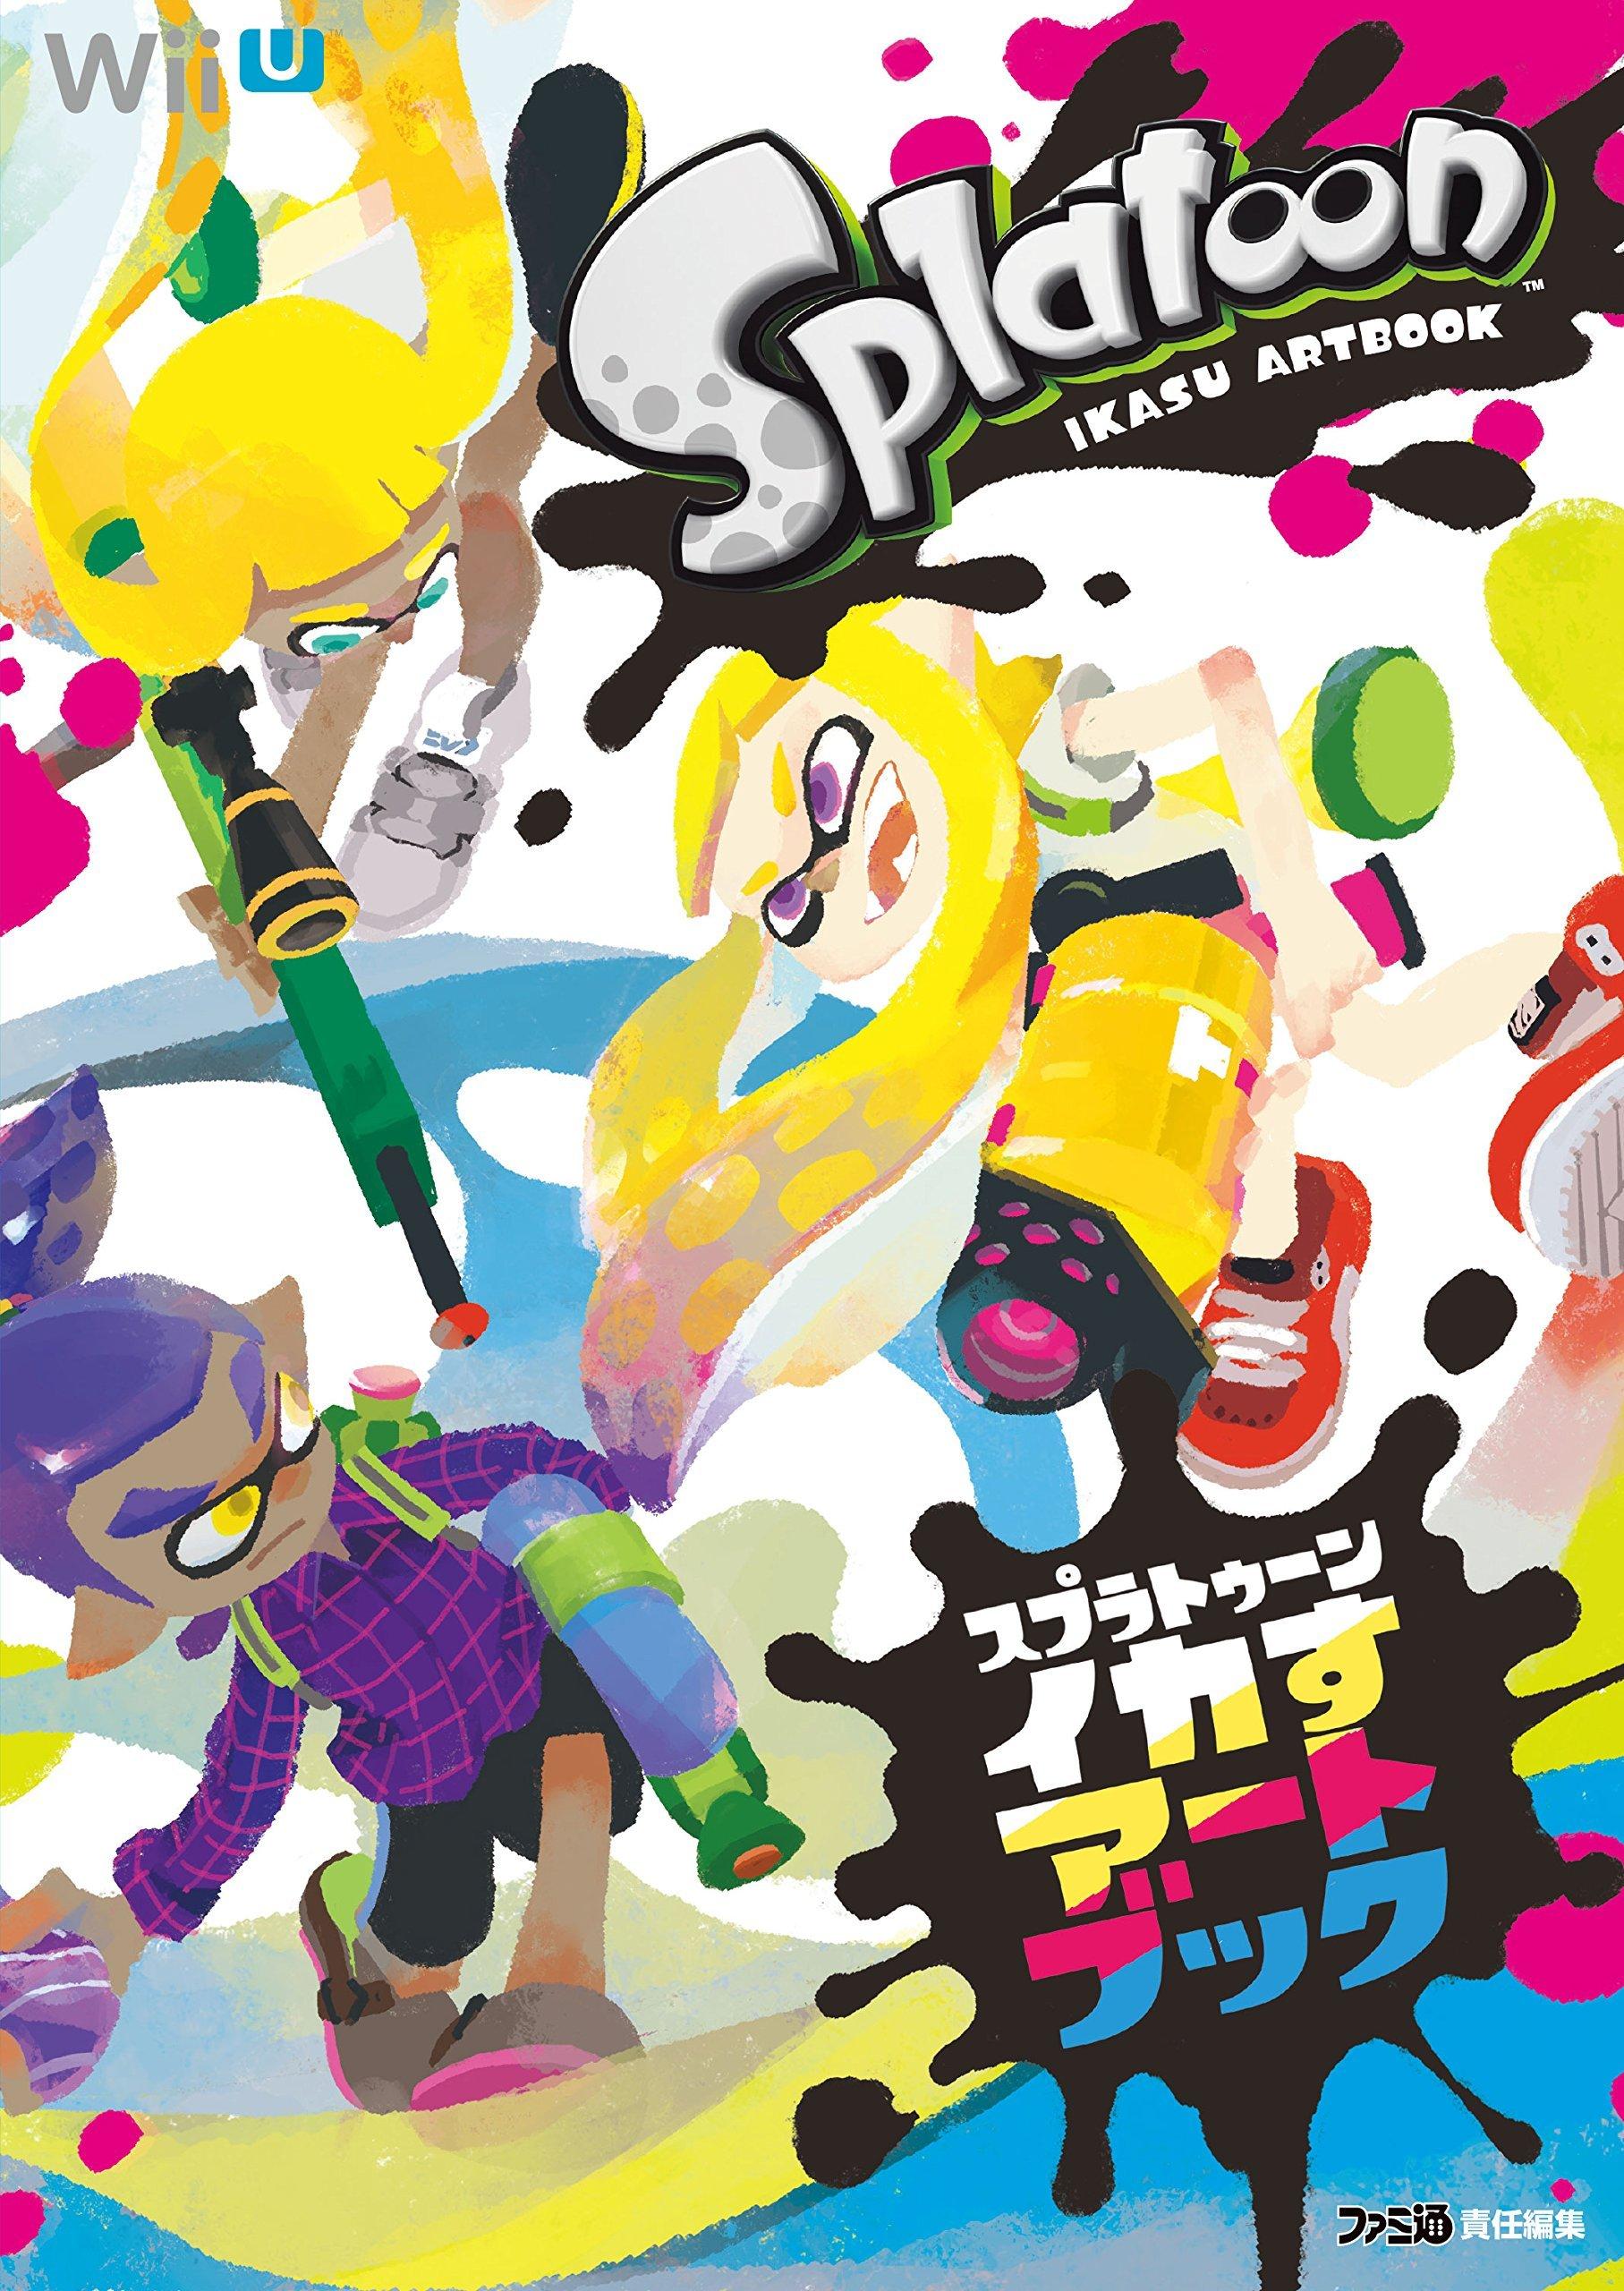 Splatoon Ikasu Art Book KADOKAWA Enter Frain Illustrations